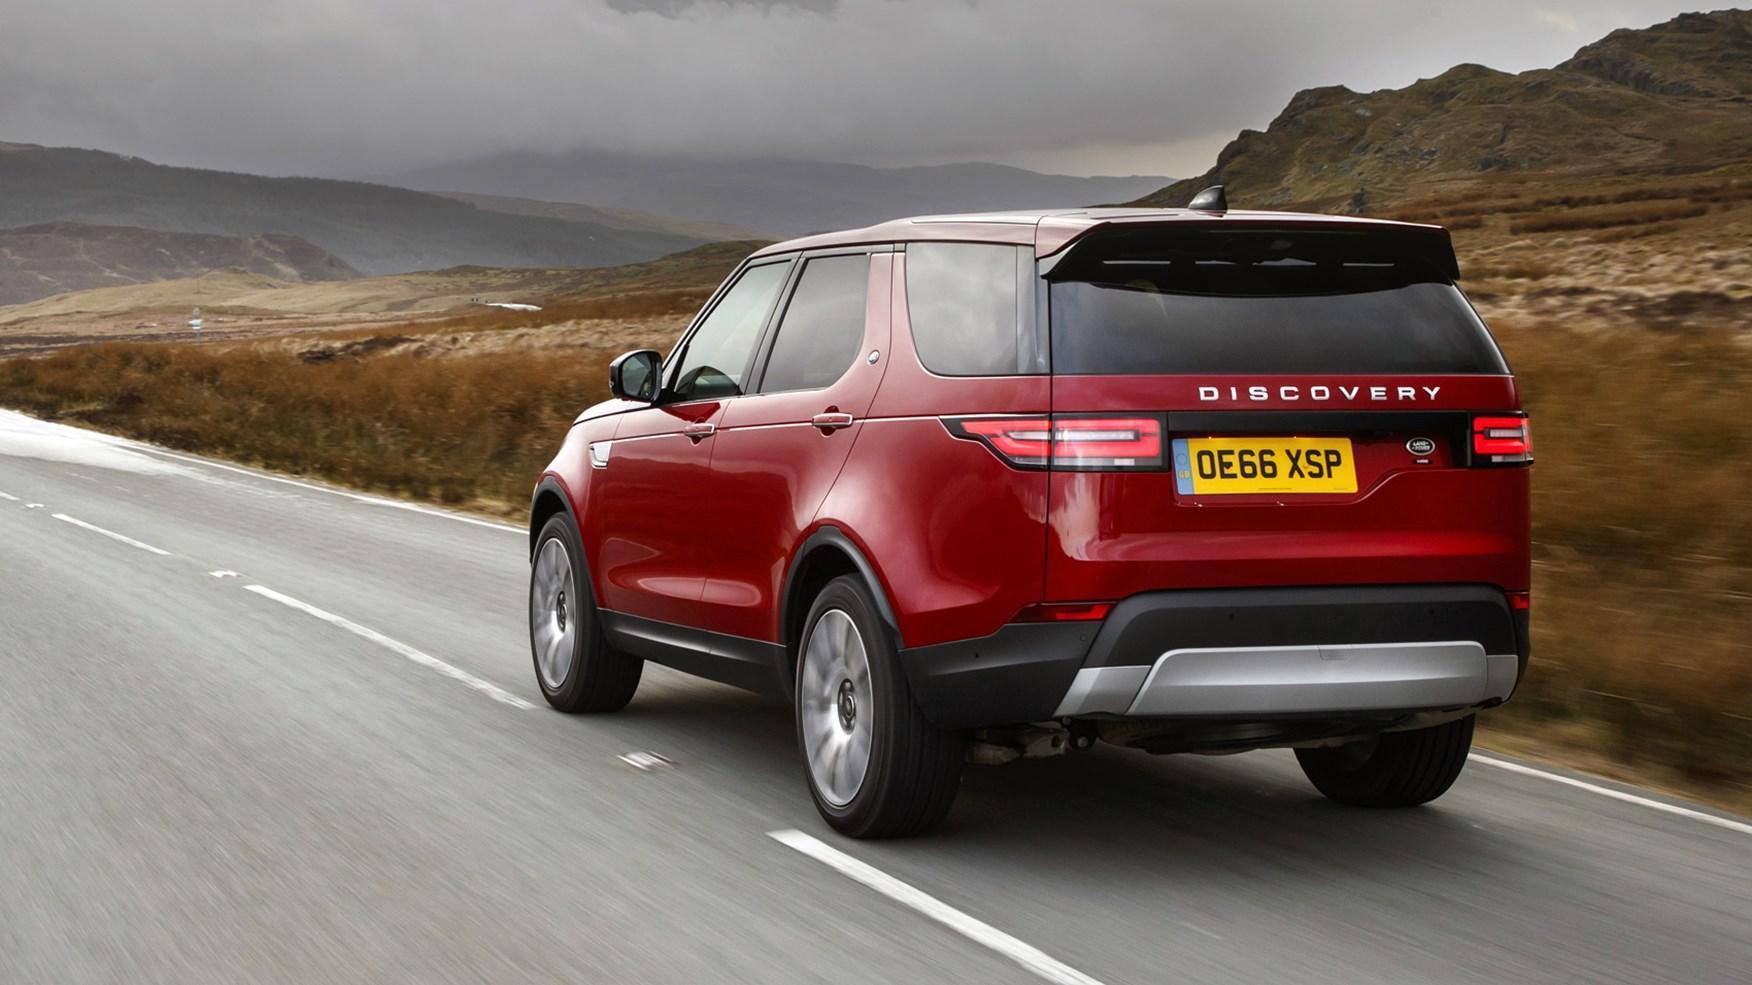 Land Rover Discovery Sd4 2017 Review Car Magazine